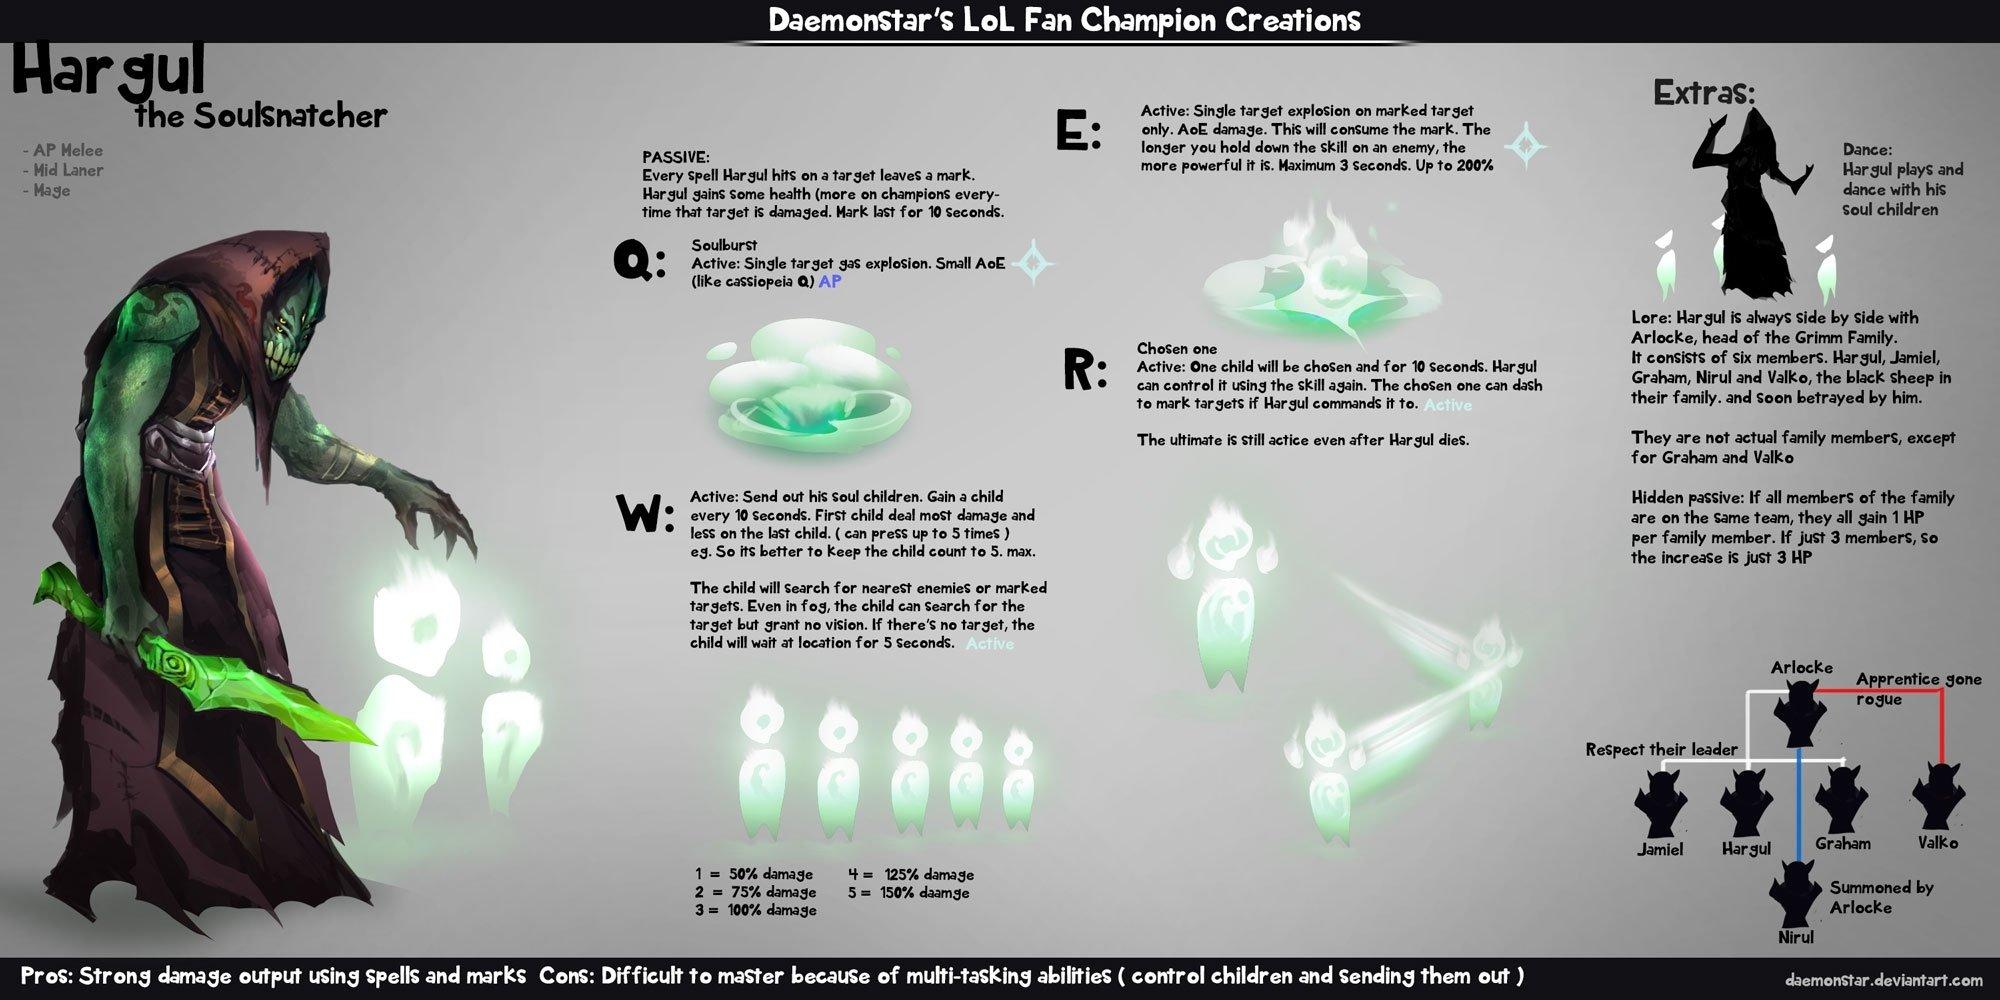 10 Best League Of Legends Champion Ideas lol fan champion creations harguldaemonstar on deviantart 2021